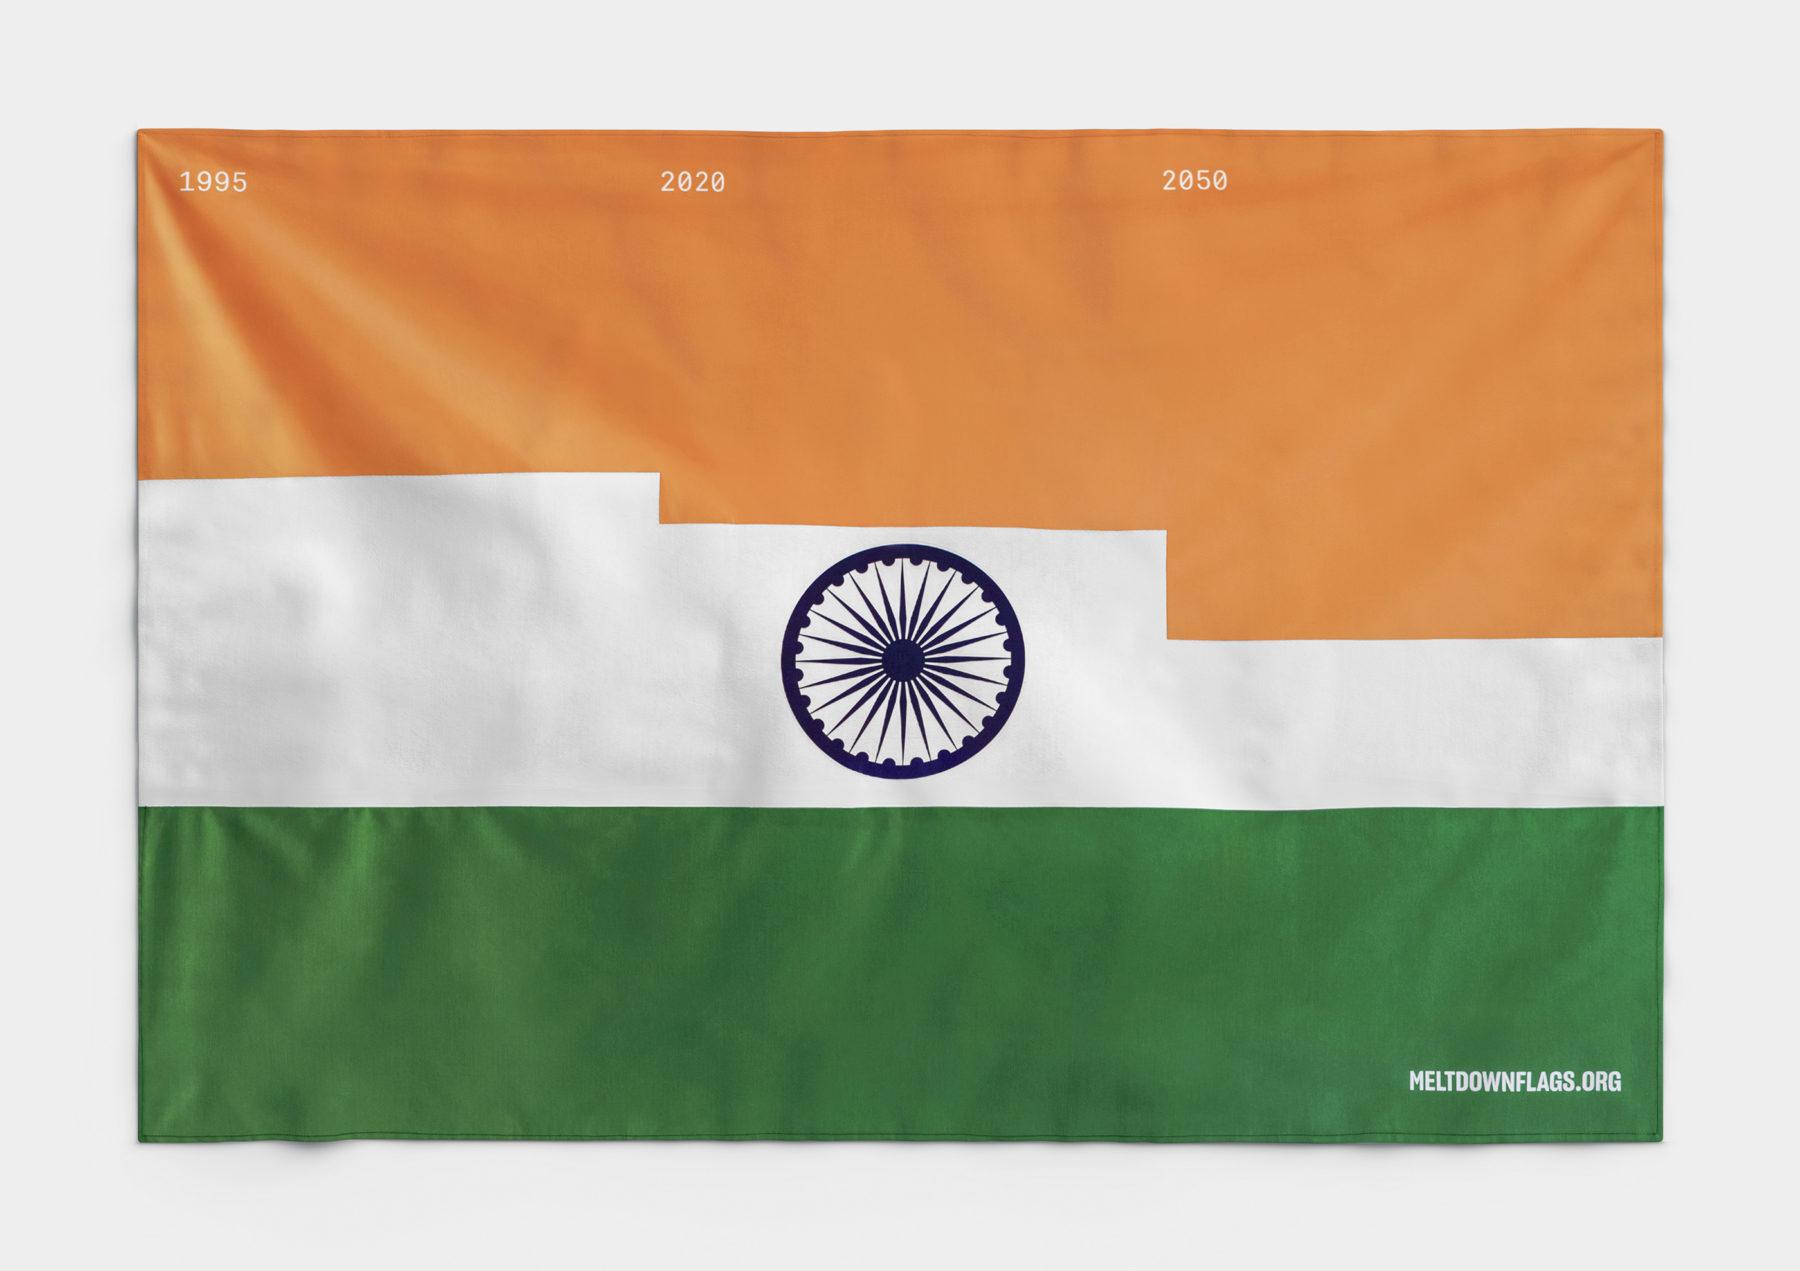 meltdown flags 11